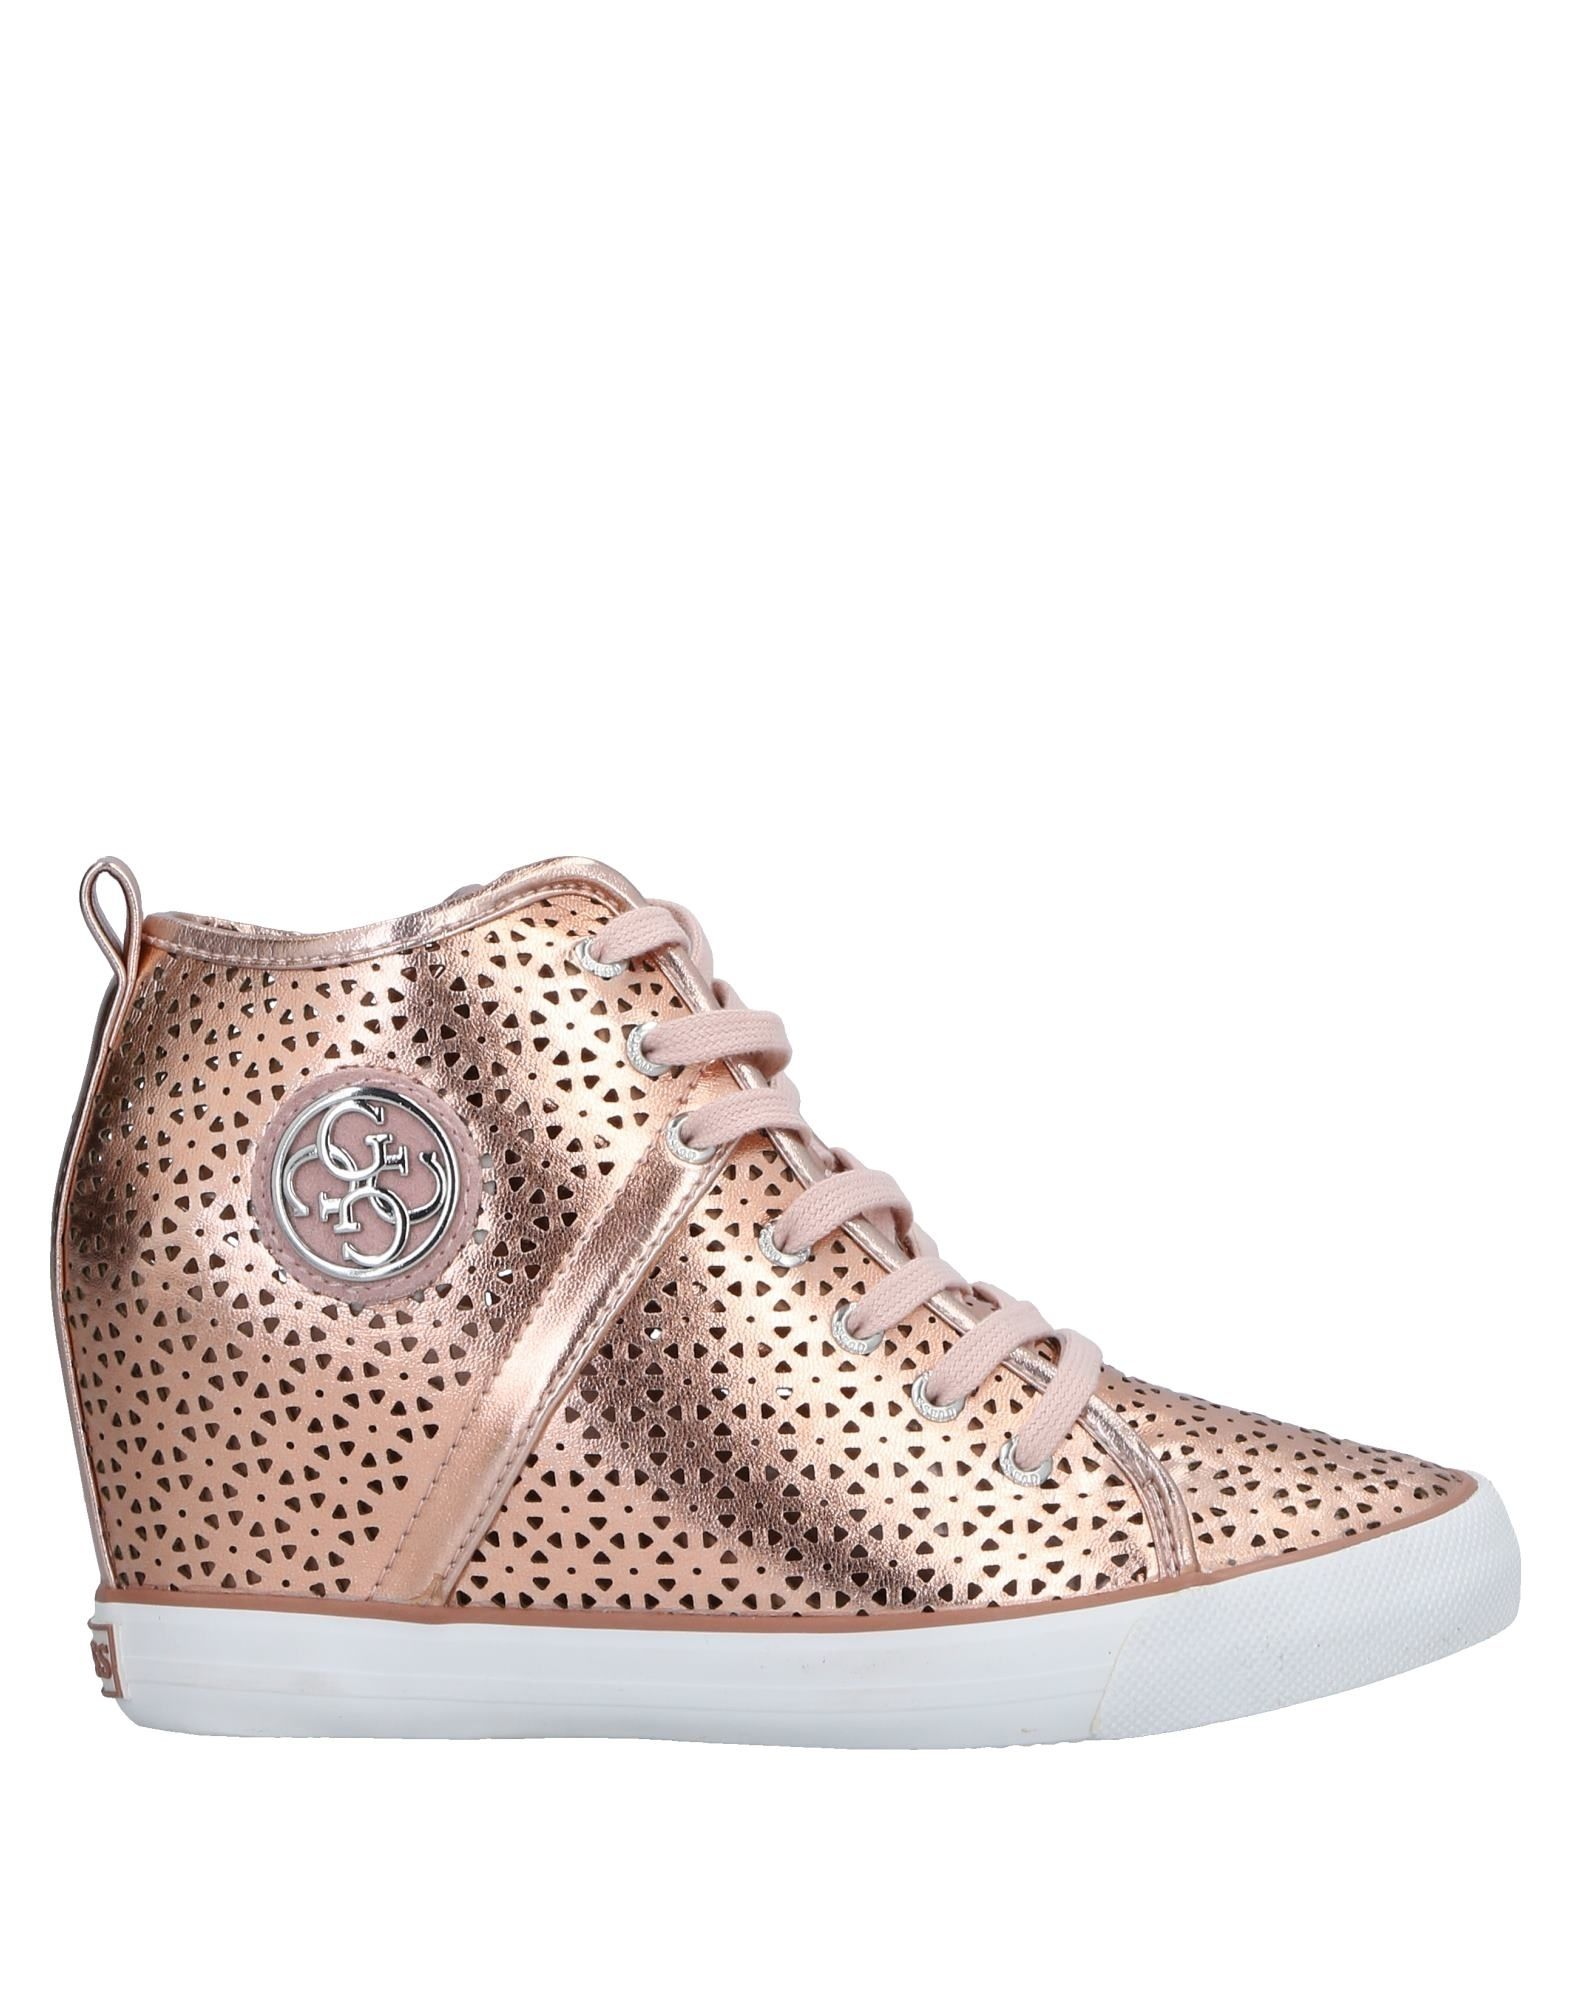 Chaussures Femme Baskets Guess Dernières Rose PREUHEOwqn